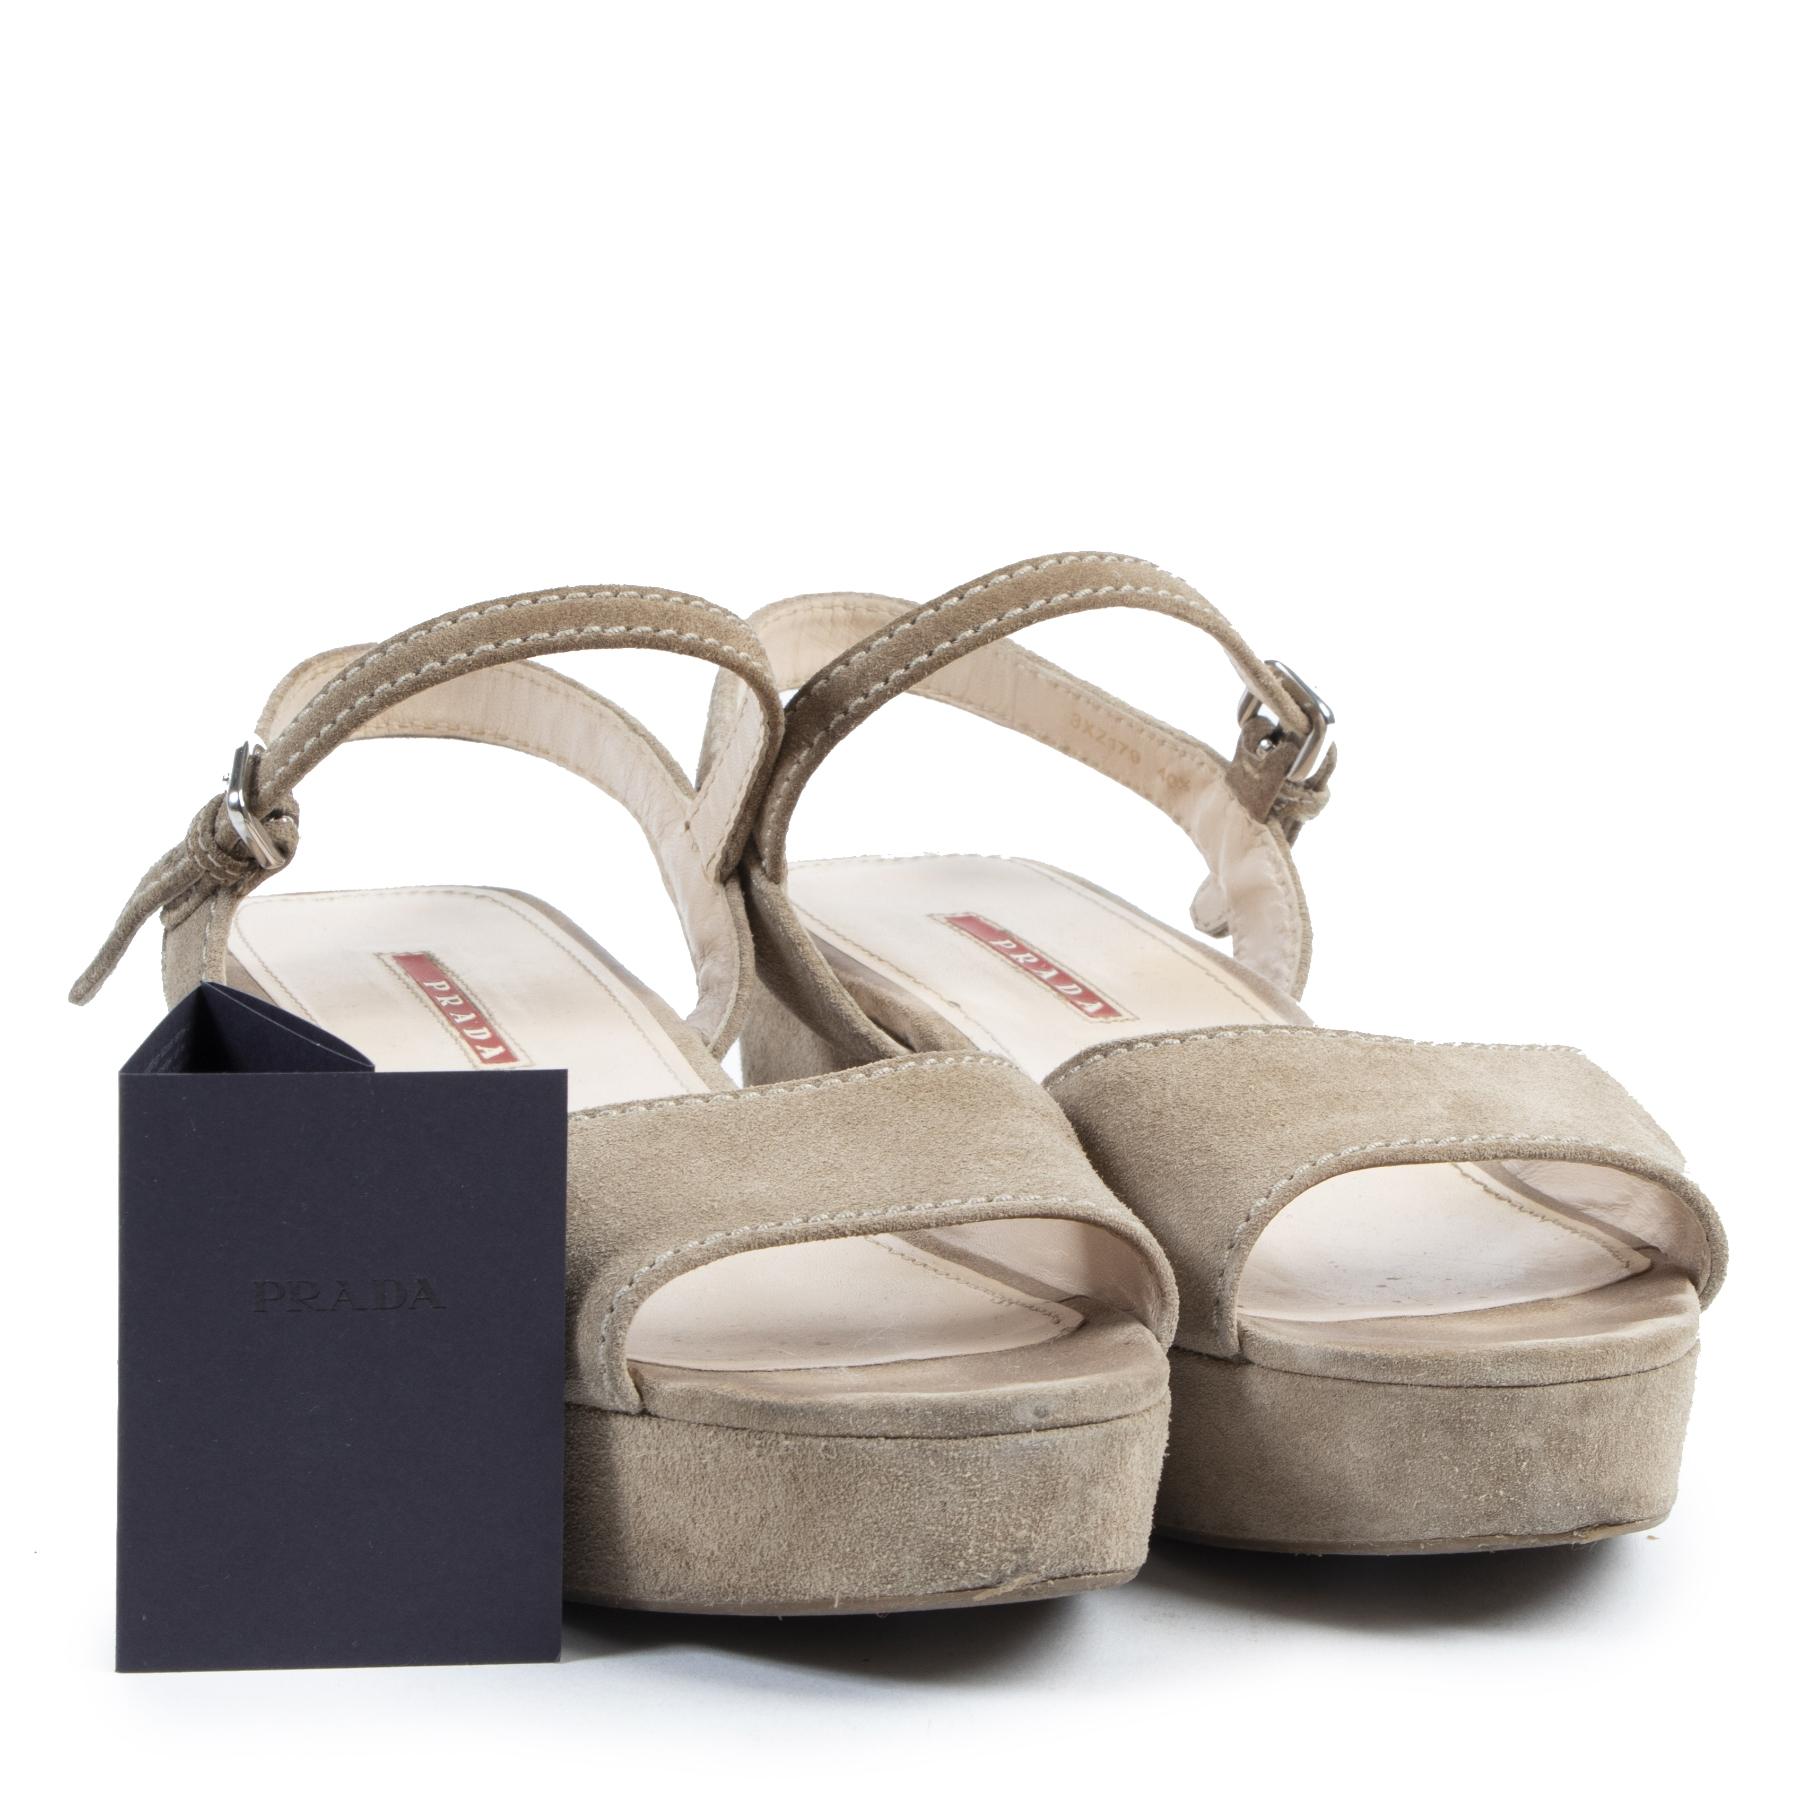 Authentieke tweedehands vintage Prada Suede Espadrille Wedges Sandals - Size 40,5 koop online webshop LabelLOV